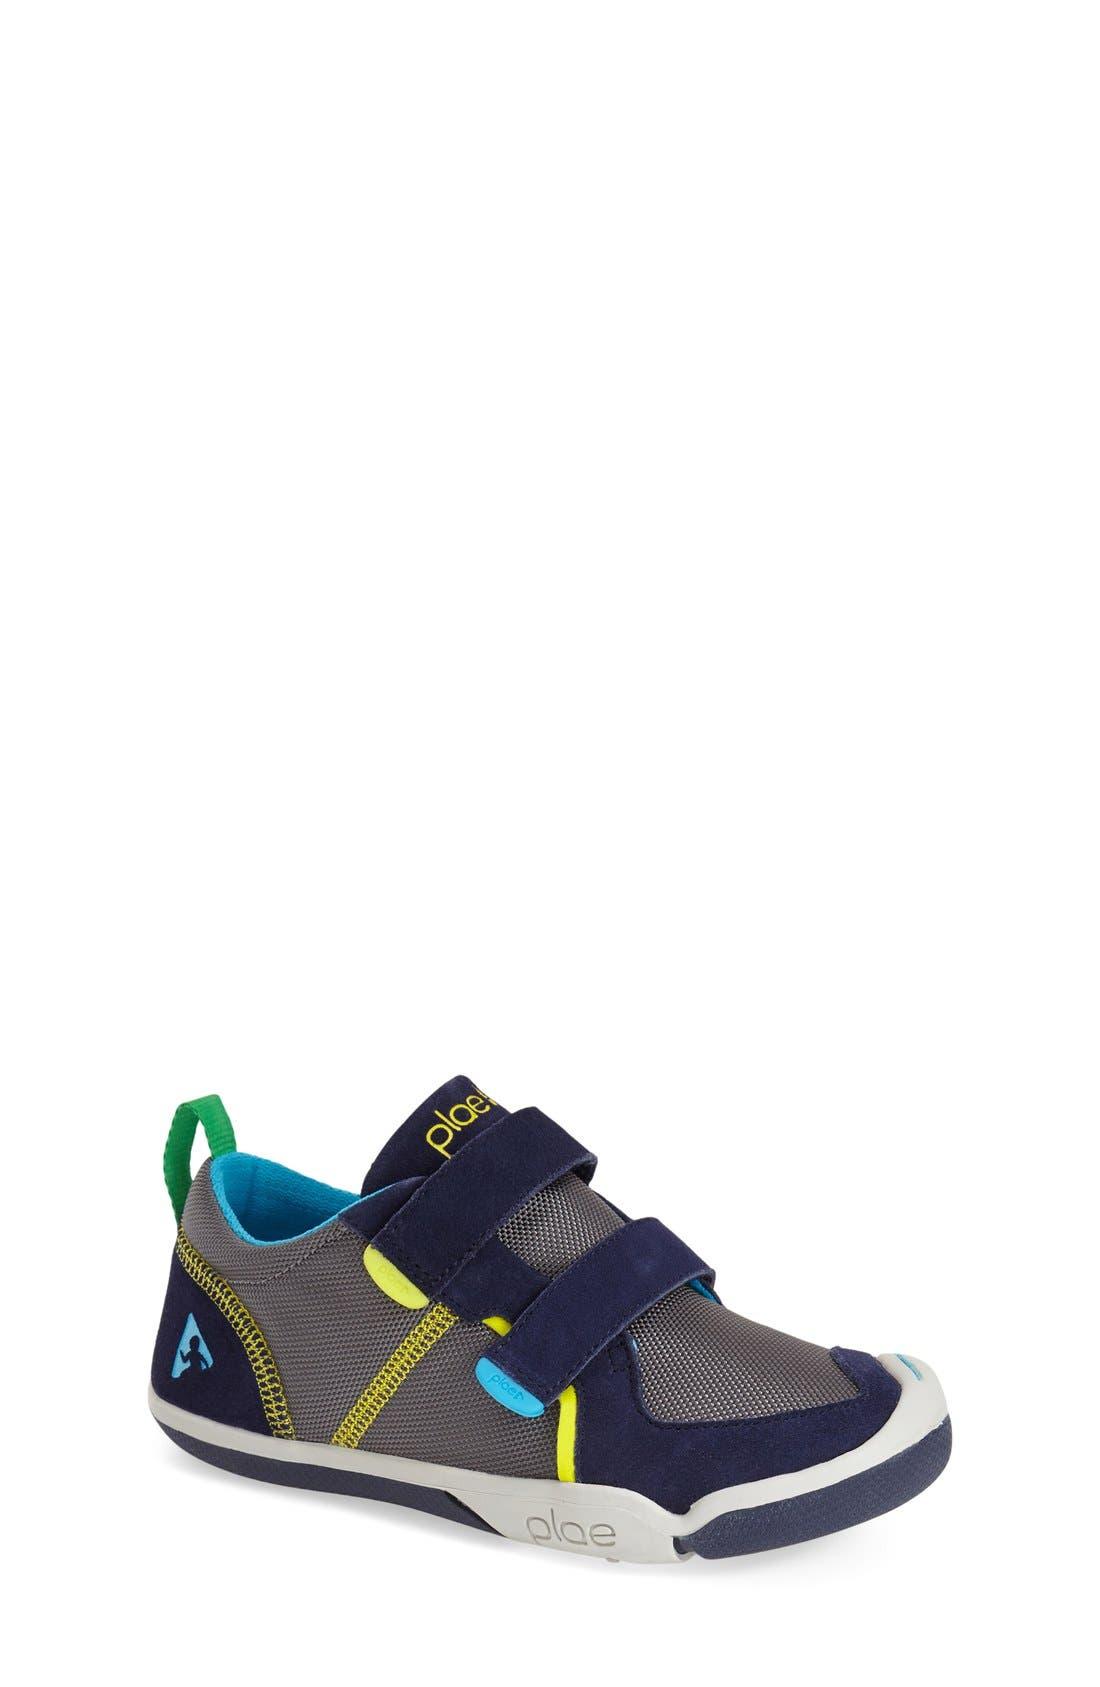 Ty Customizable Sneaker,                             Main thumbnail 1, color,                             NAVY/ STEEL